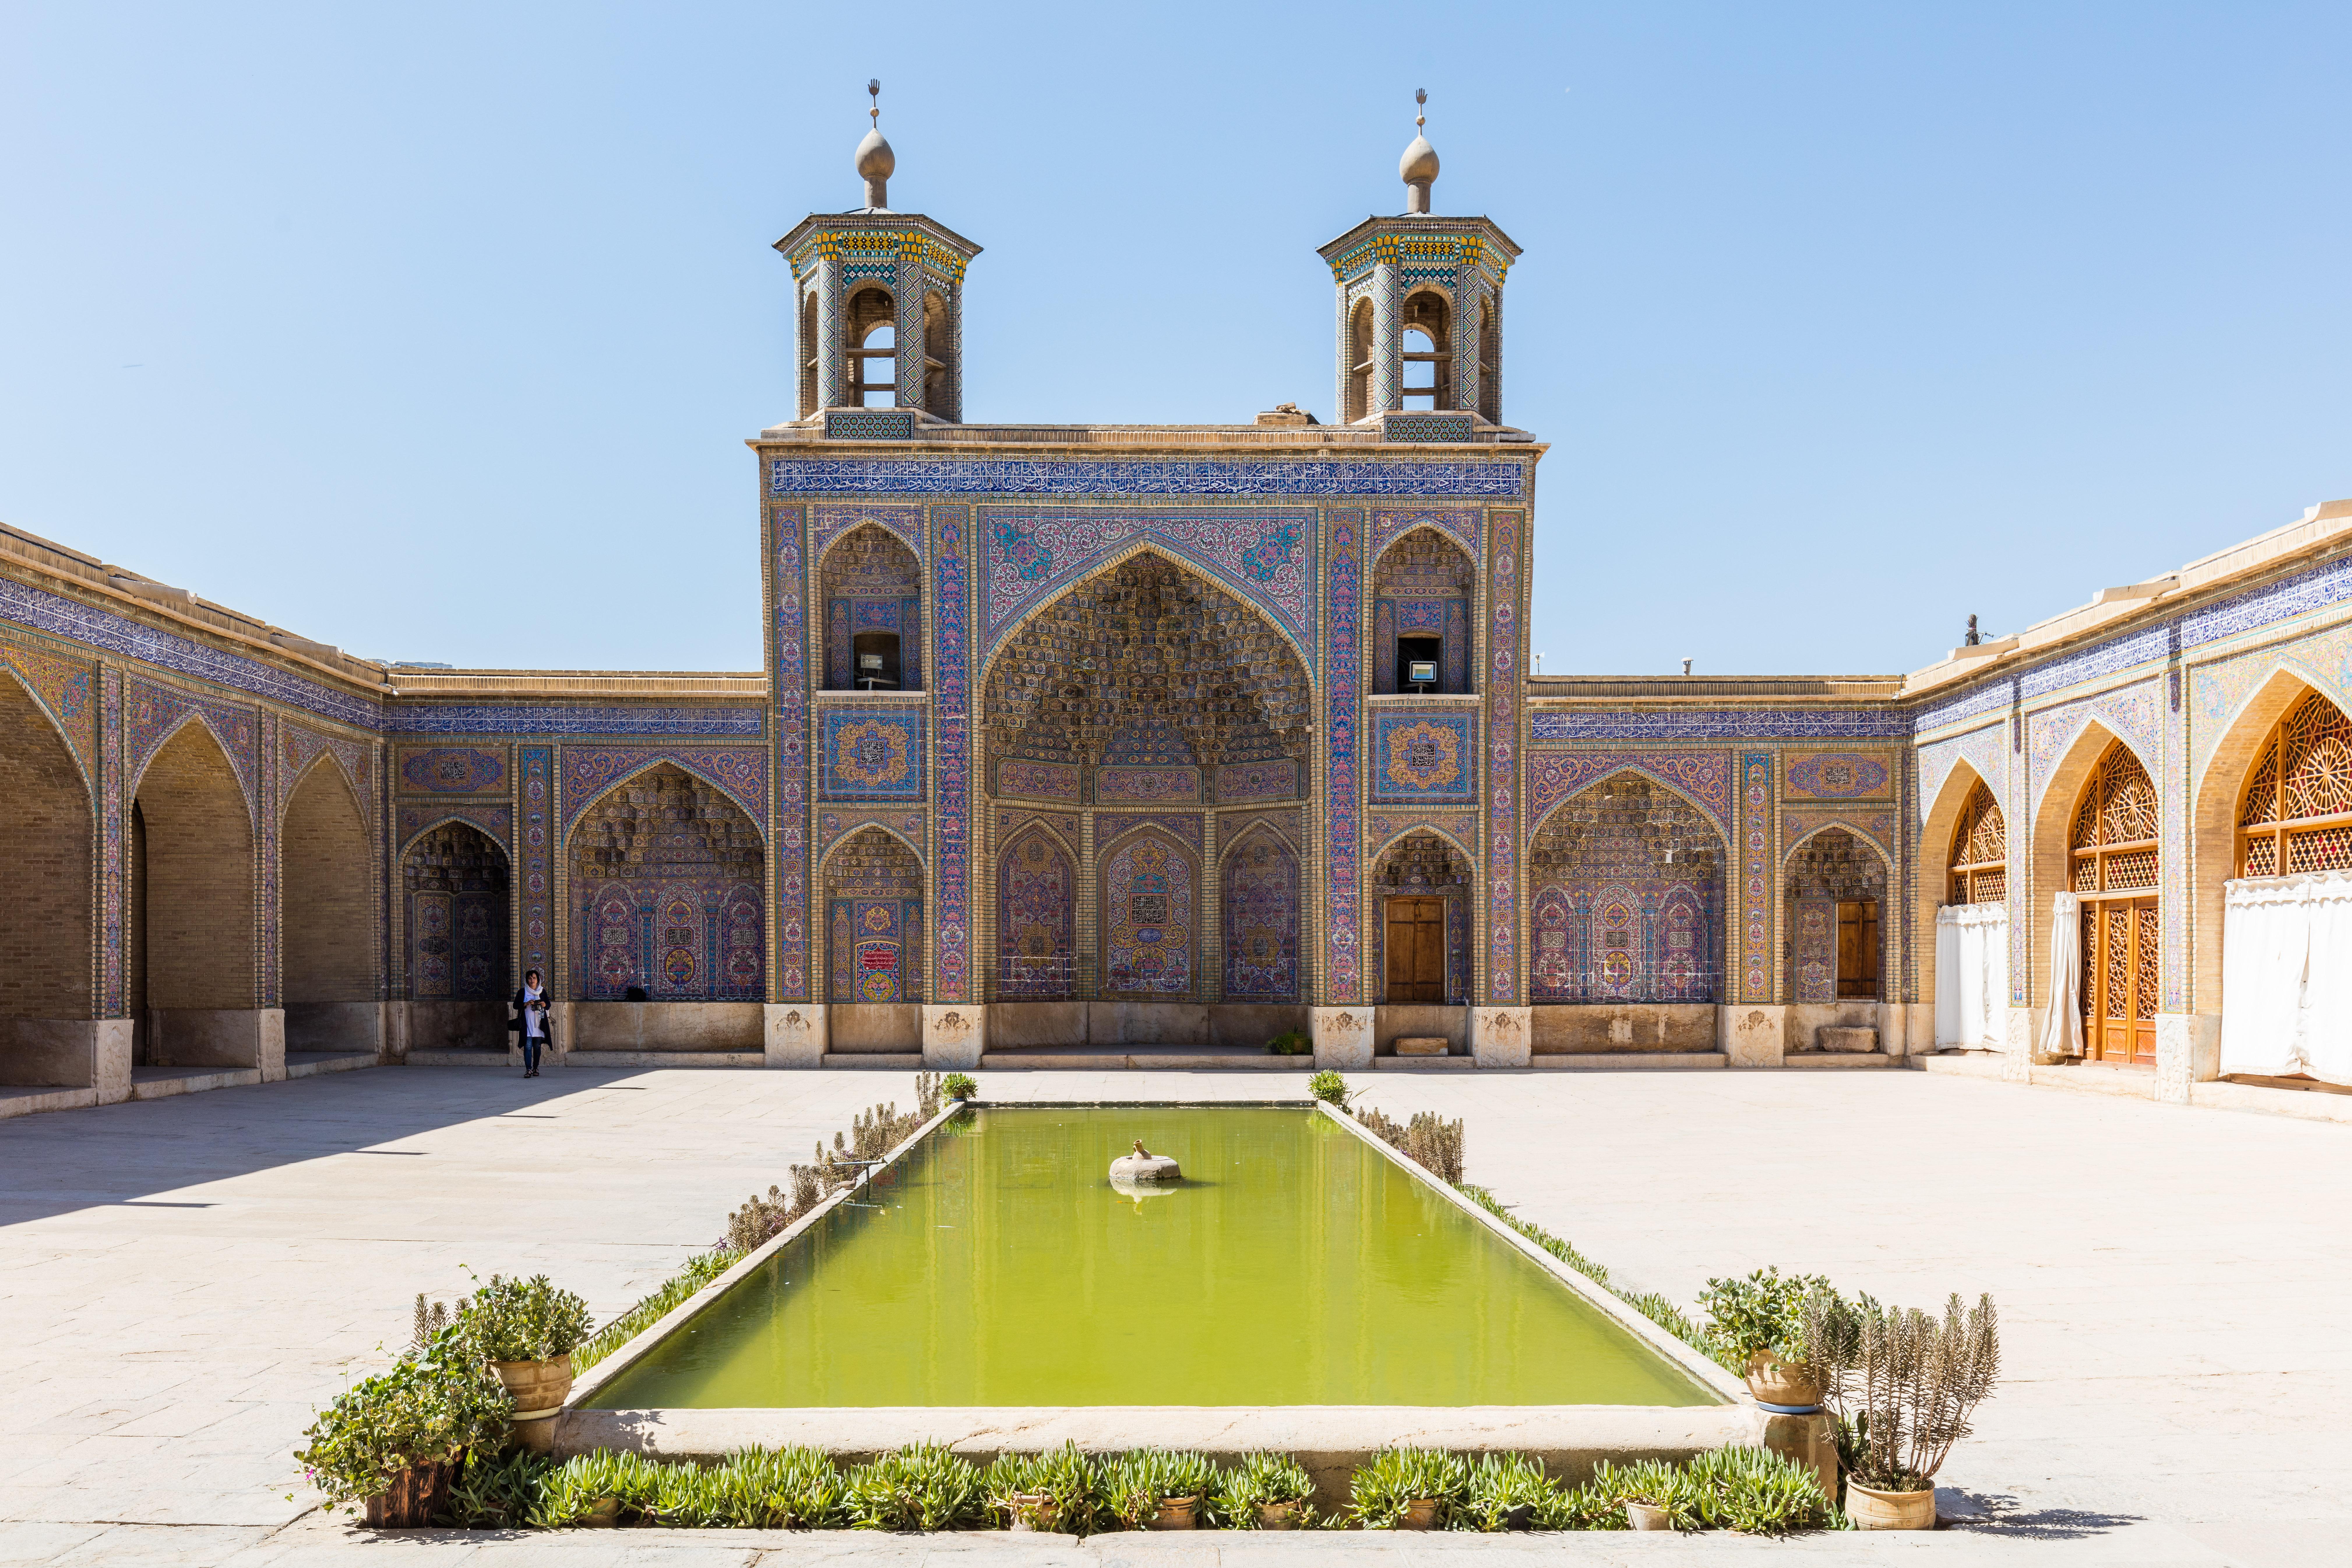 Mezquita Image: File:Mezquita De Nasirolmolk, Shiraz, Irán, 2016-09-24, DD